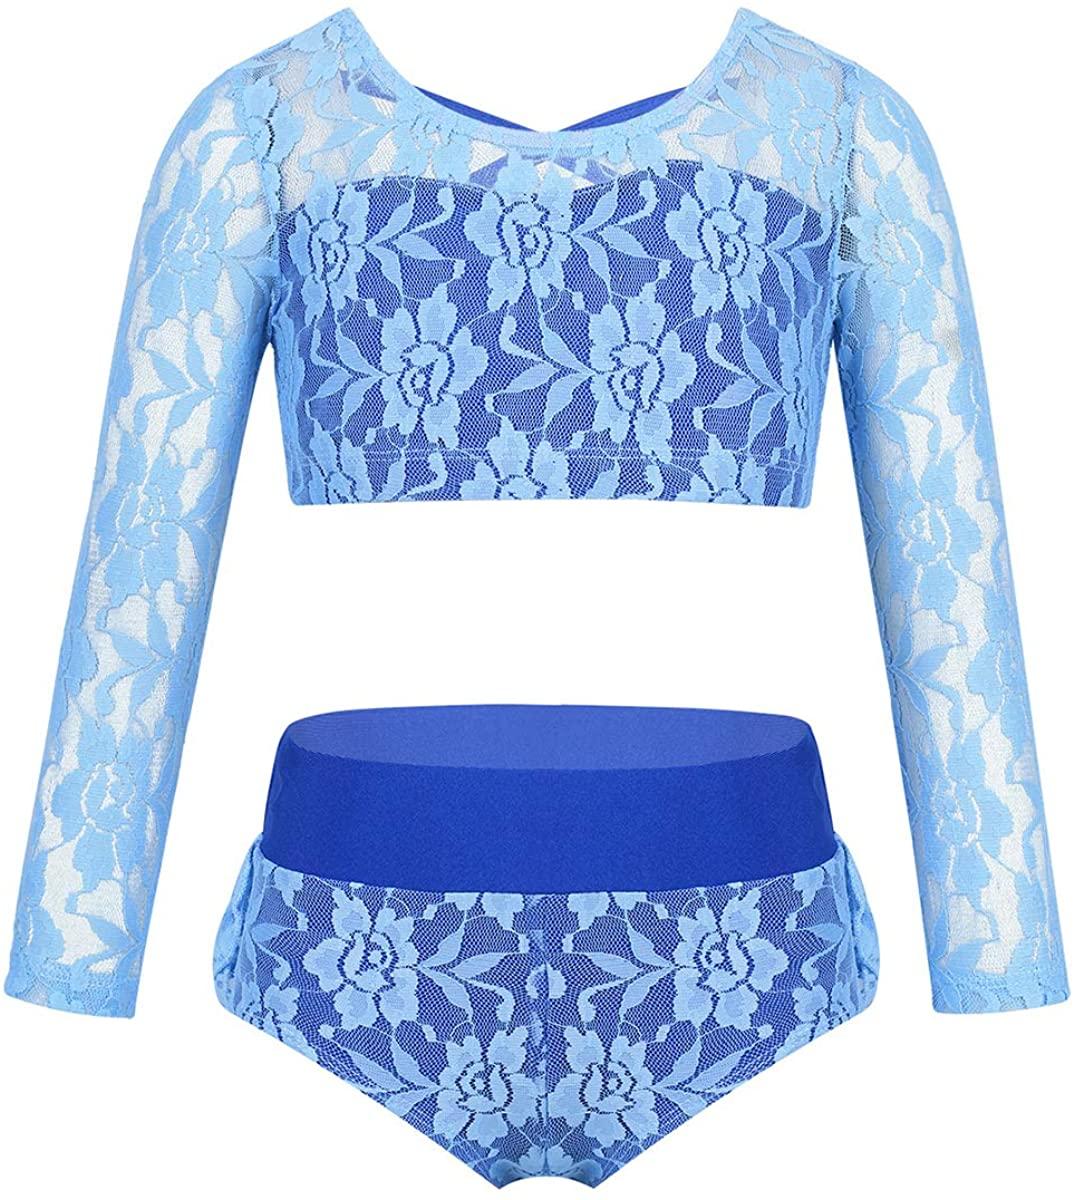 iiniim Kids Girls 2 Pieces Dancing Sports Outfits Gymnastic Leotard Long Sleeves Crop Top with Shorts Tankini Swimwear